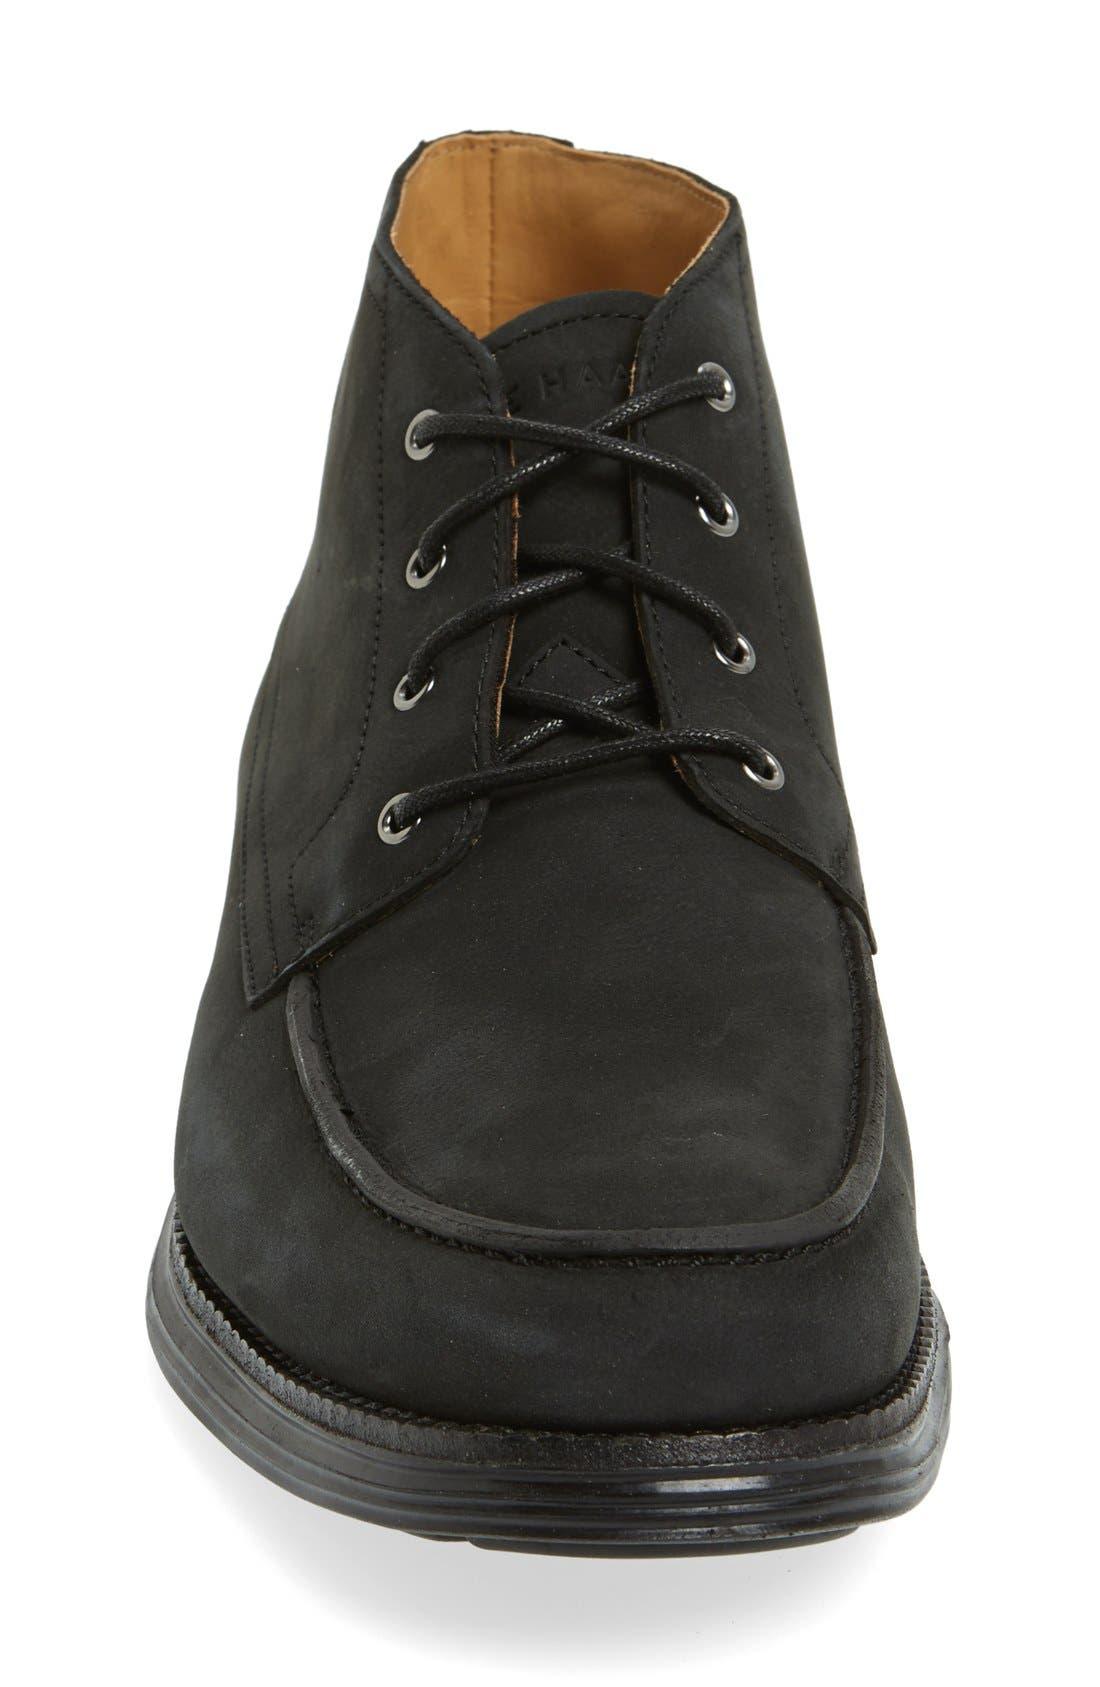 Alternate Image 3  - Cole Haan 'LunarGrand' Moc Toe Boot (Men)